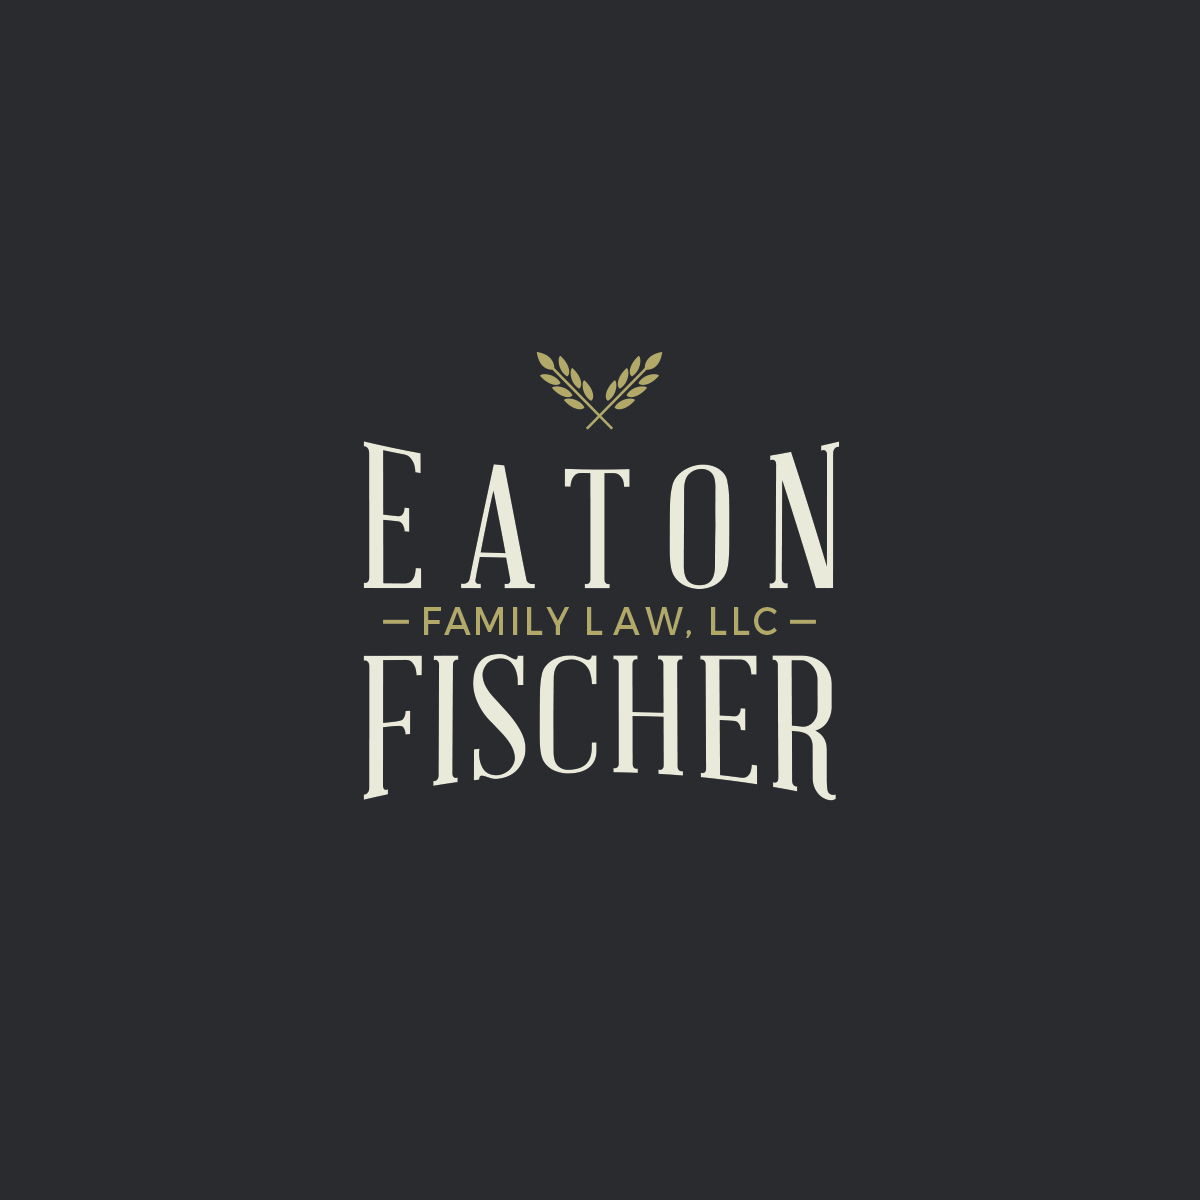 Family Law: Eaton Fischer Family Law, LLC, Lake Oswego Oregon (OR